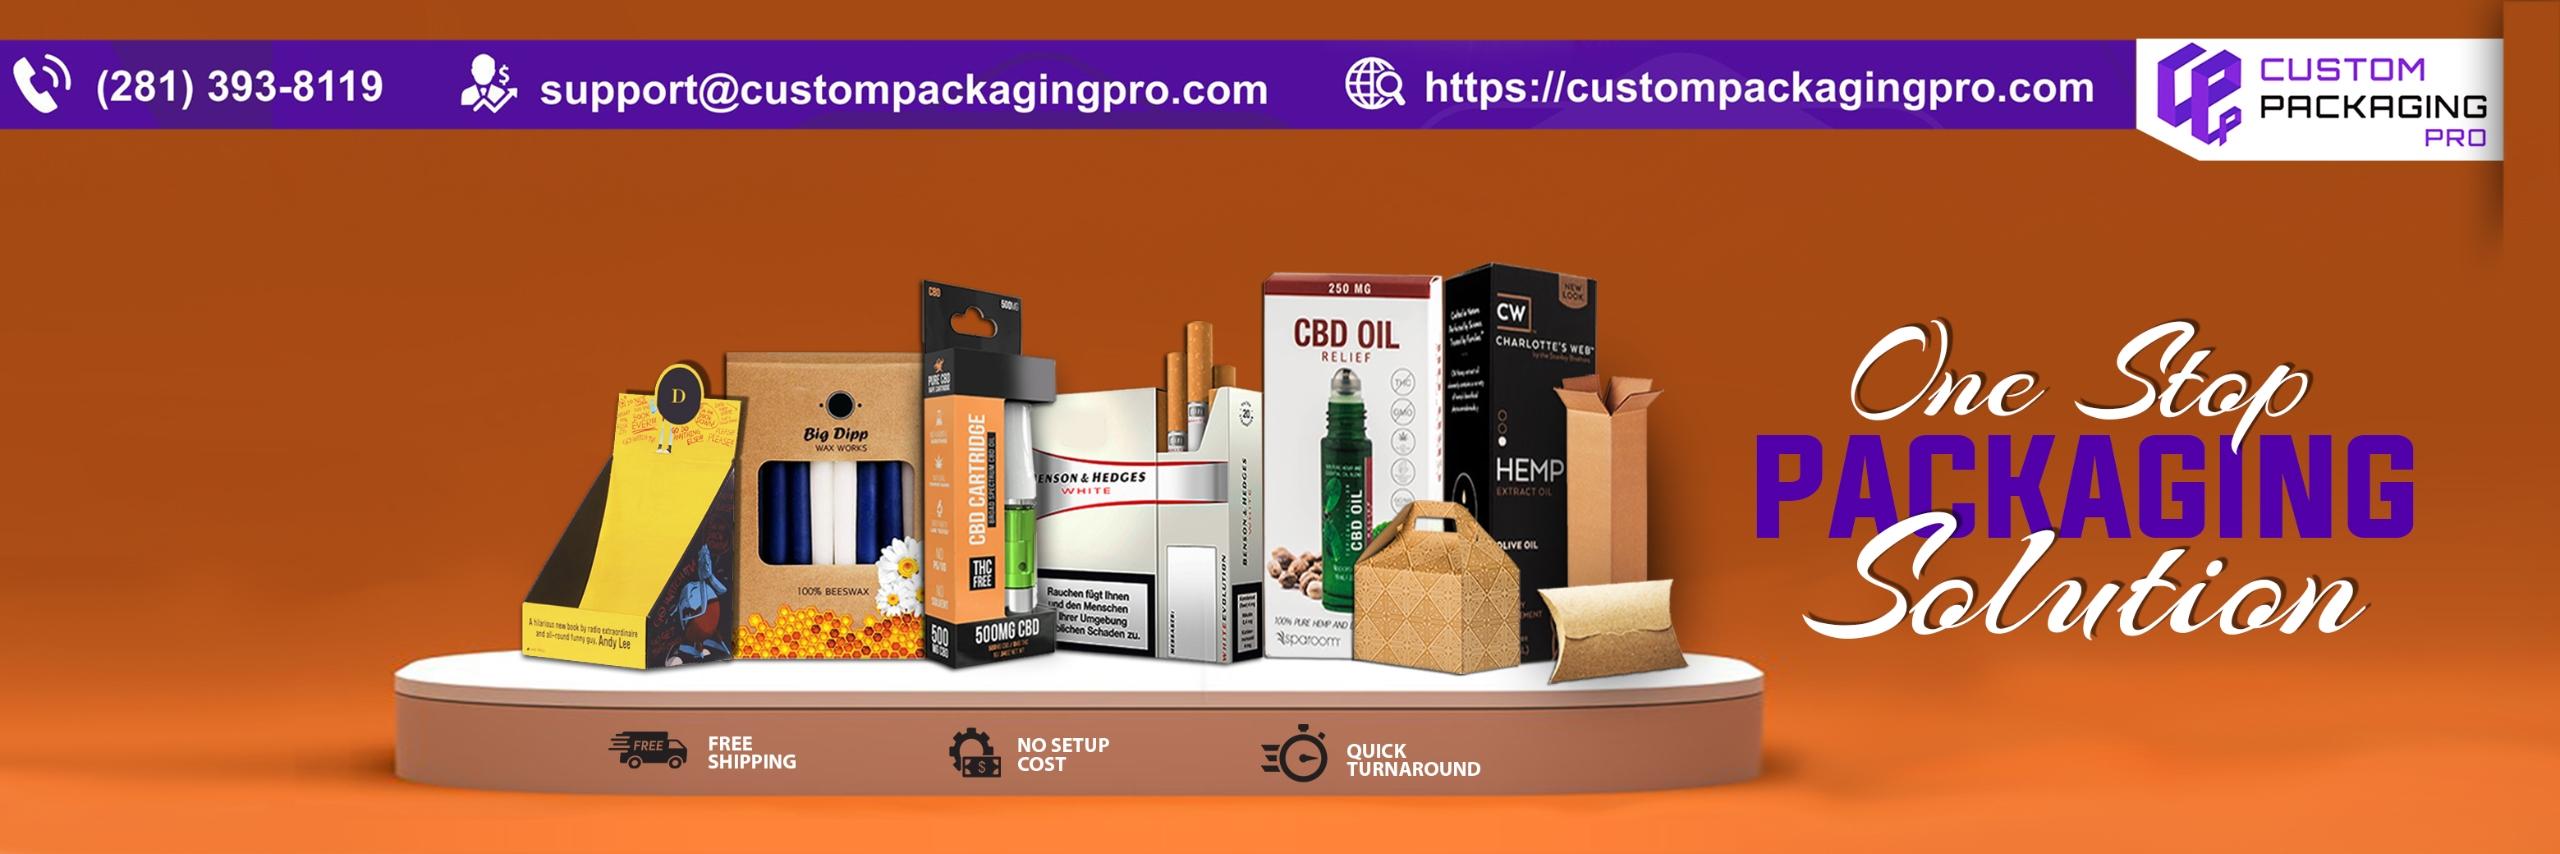 Custom Packaging Supplies (@rockykhan) Cover Image